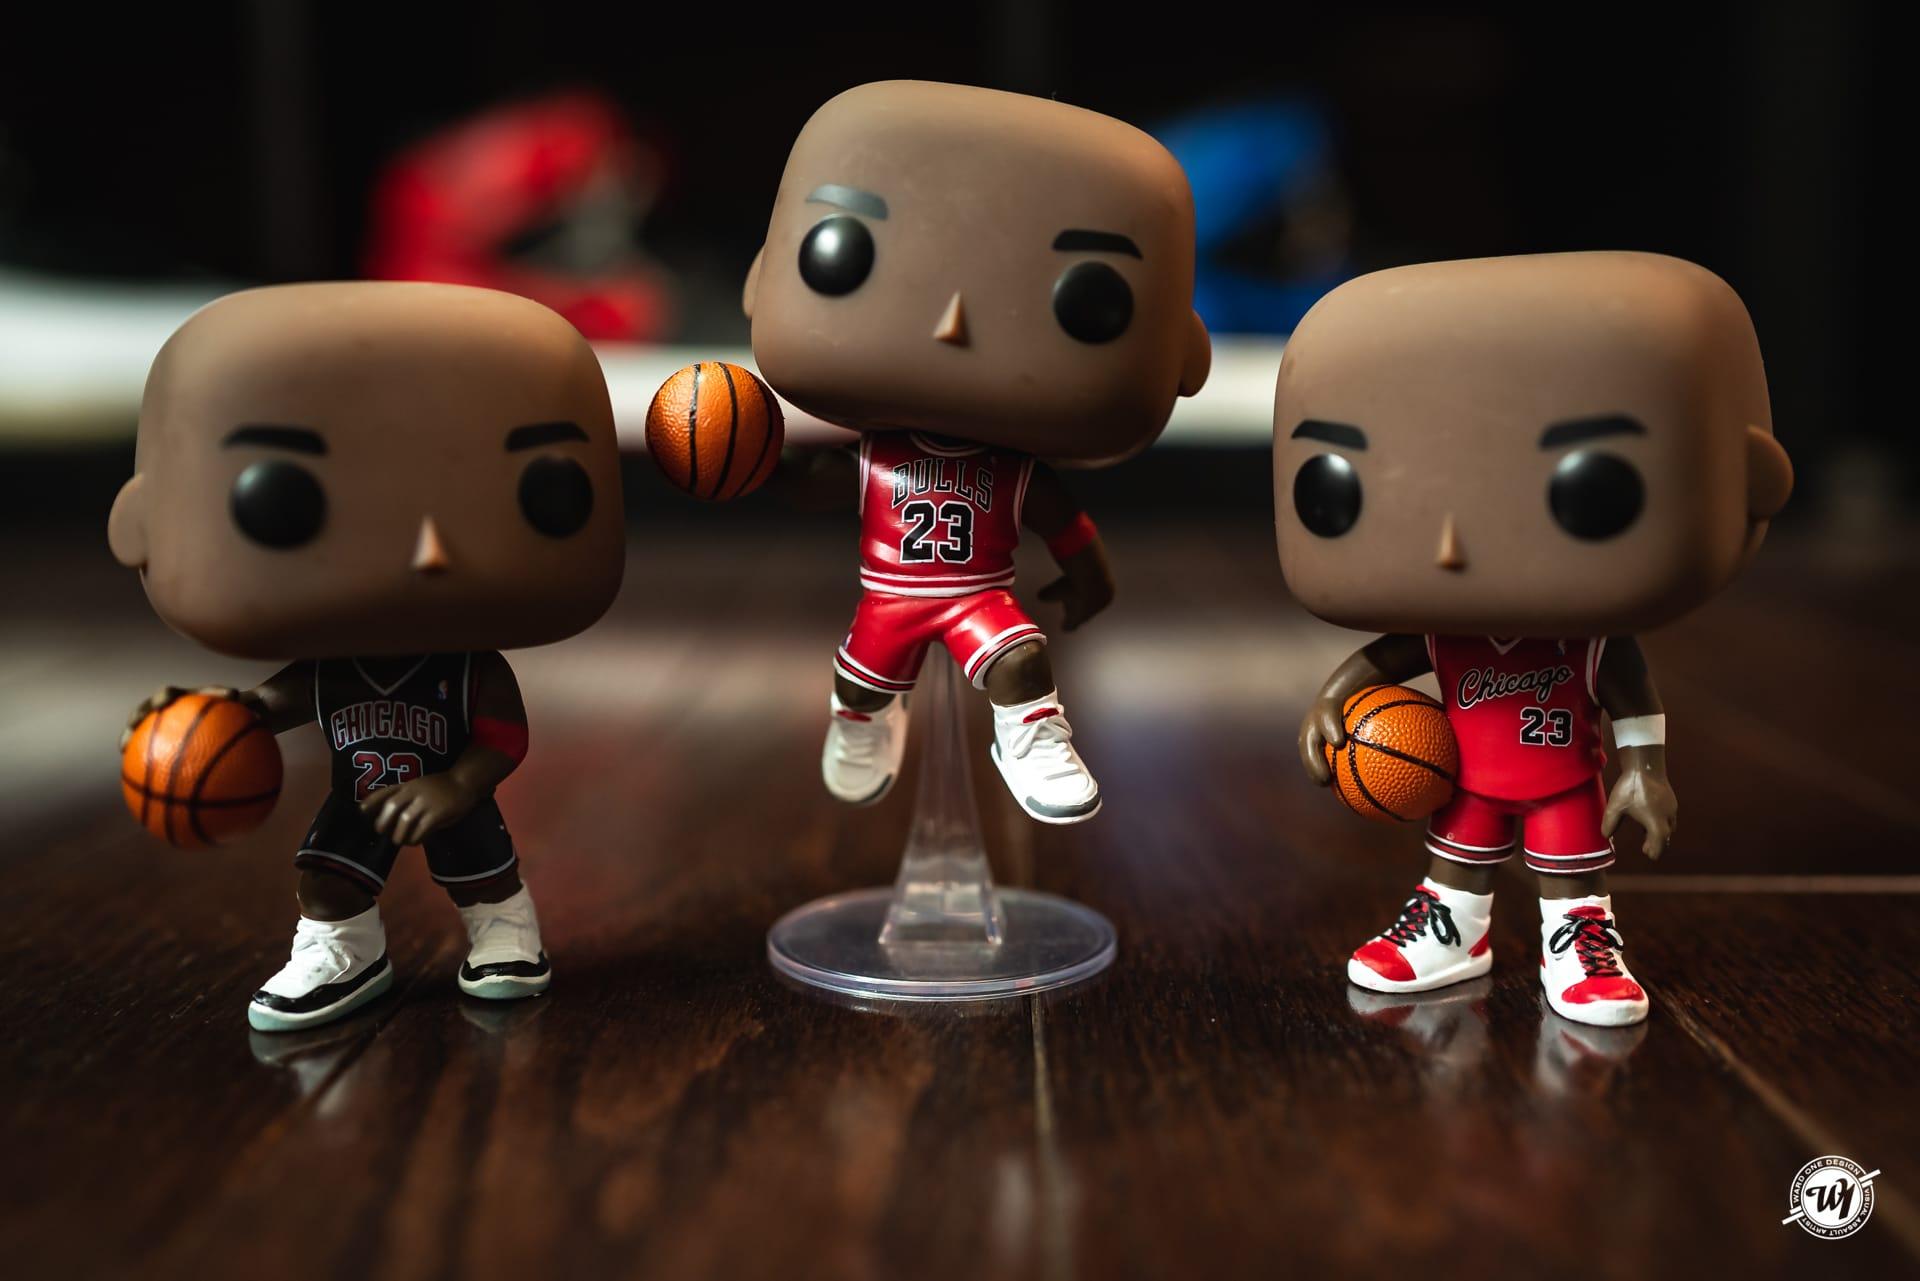 Update: Funko POP Michael Jordan